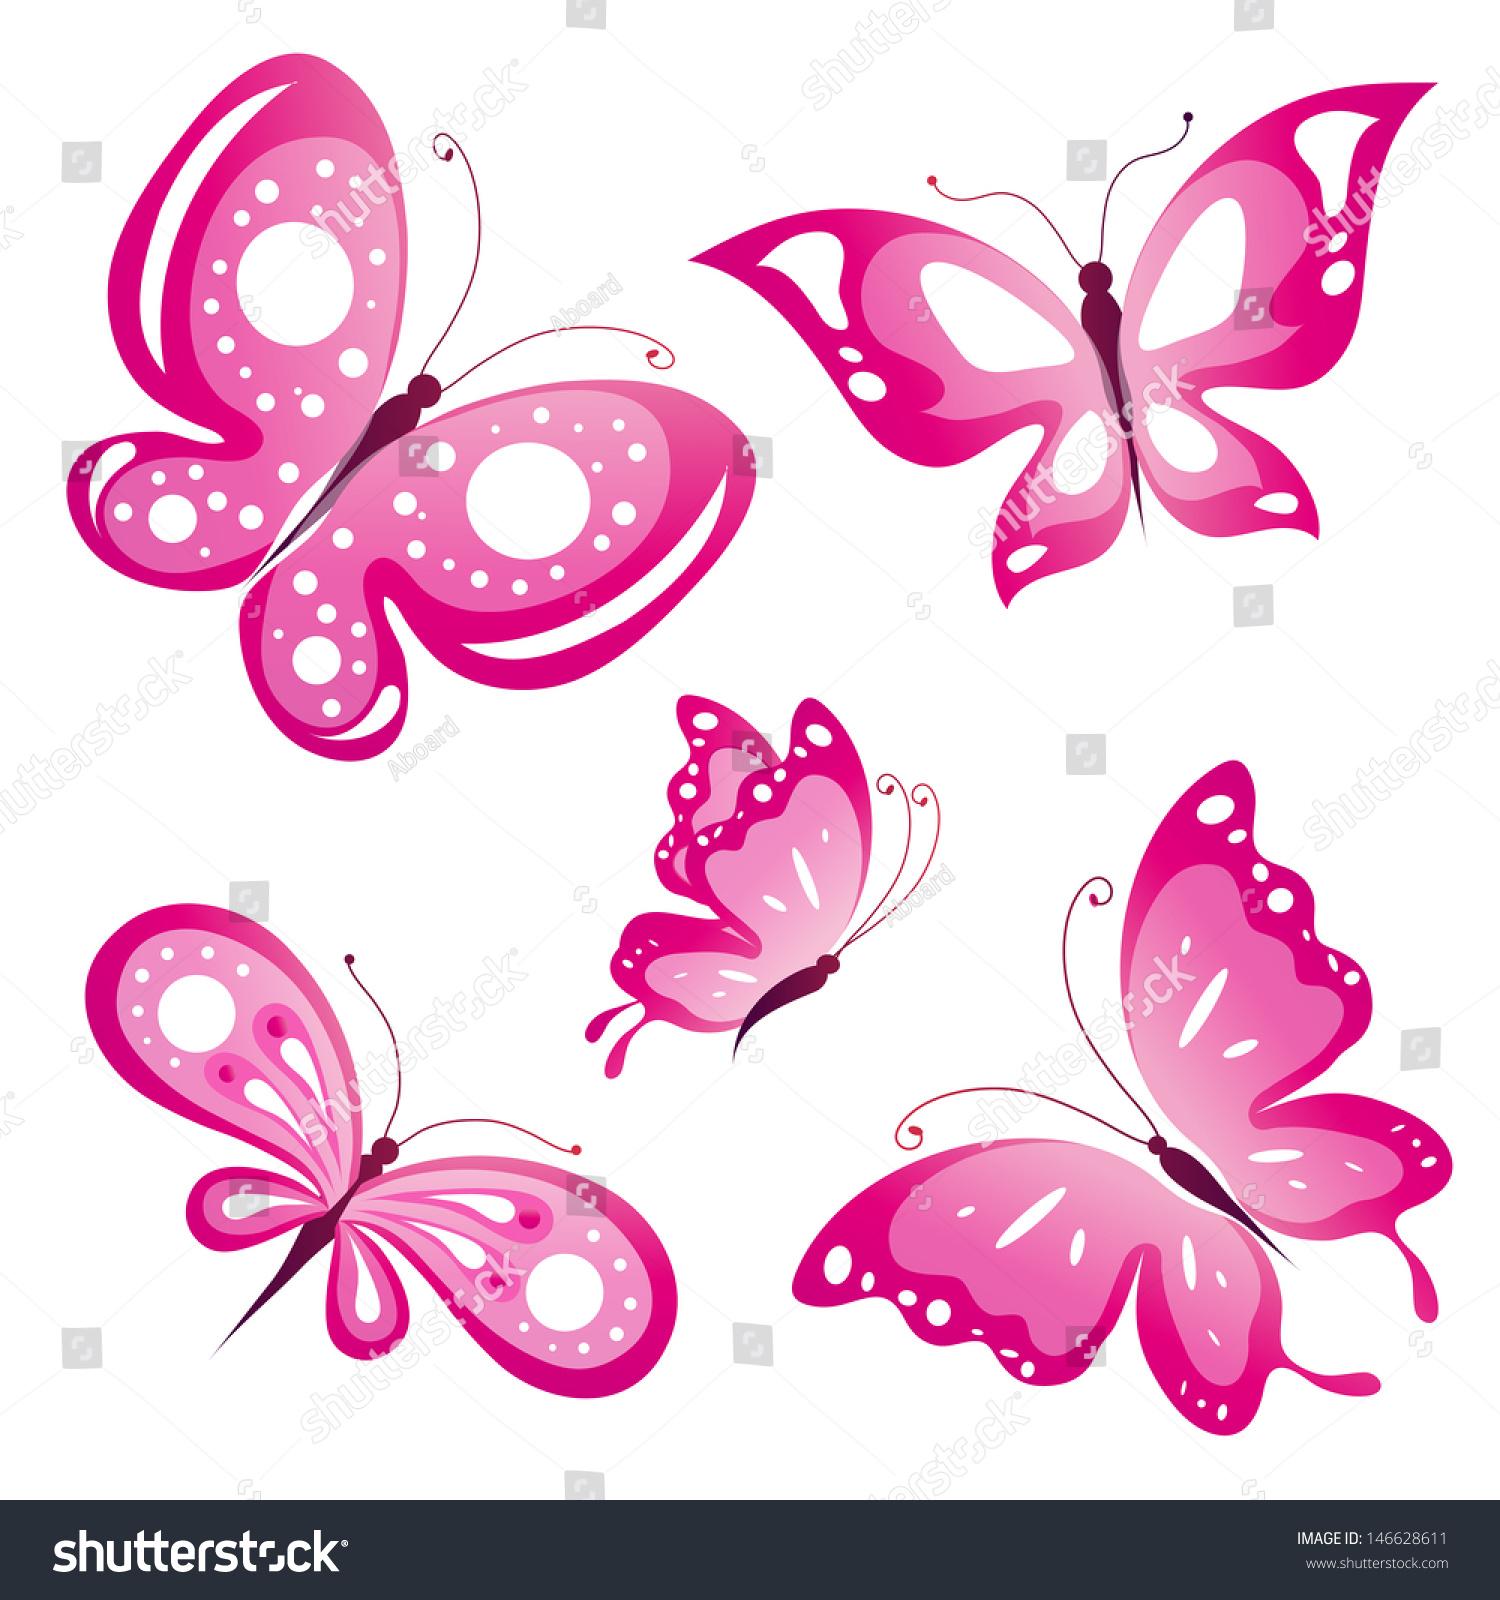 https://image.shutterstock.com/z/stock-vector-pink-butterflies-design-vector-146628611.jpg Pink Butterfly Graphics